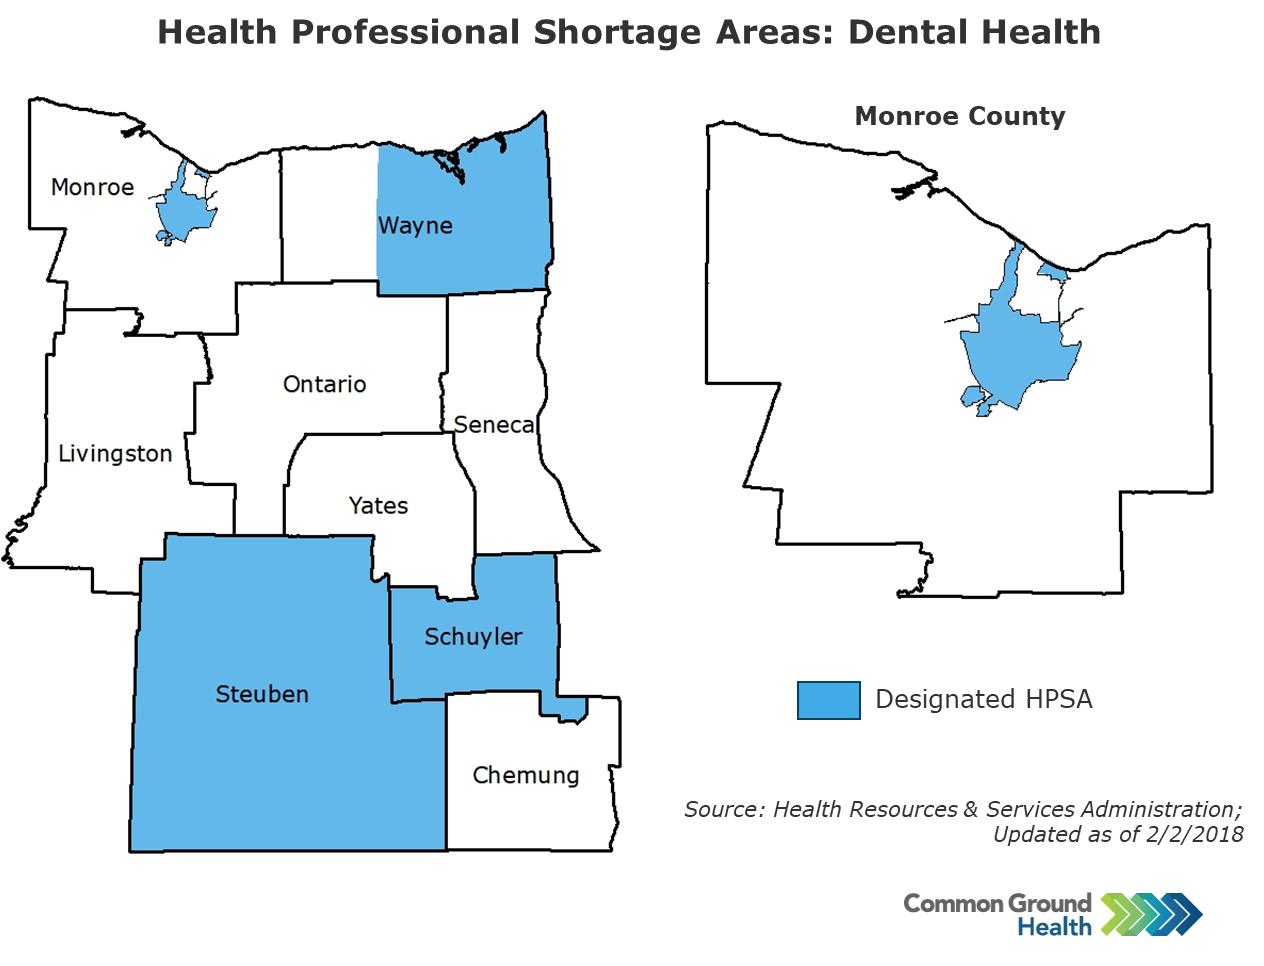 Health Professional Shortage Areas: Dental Health